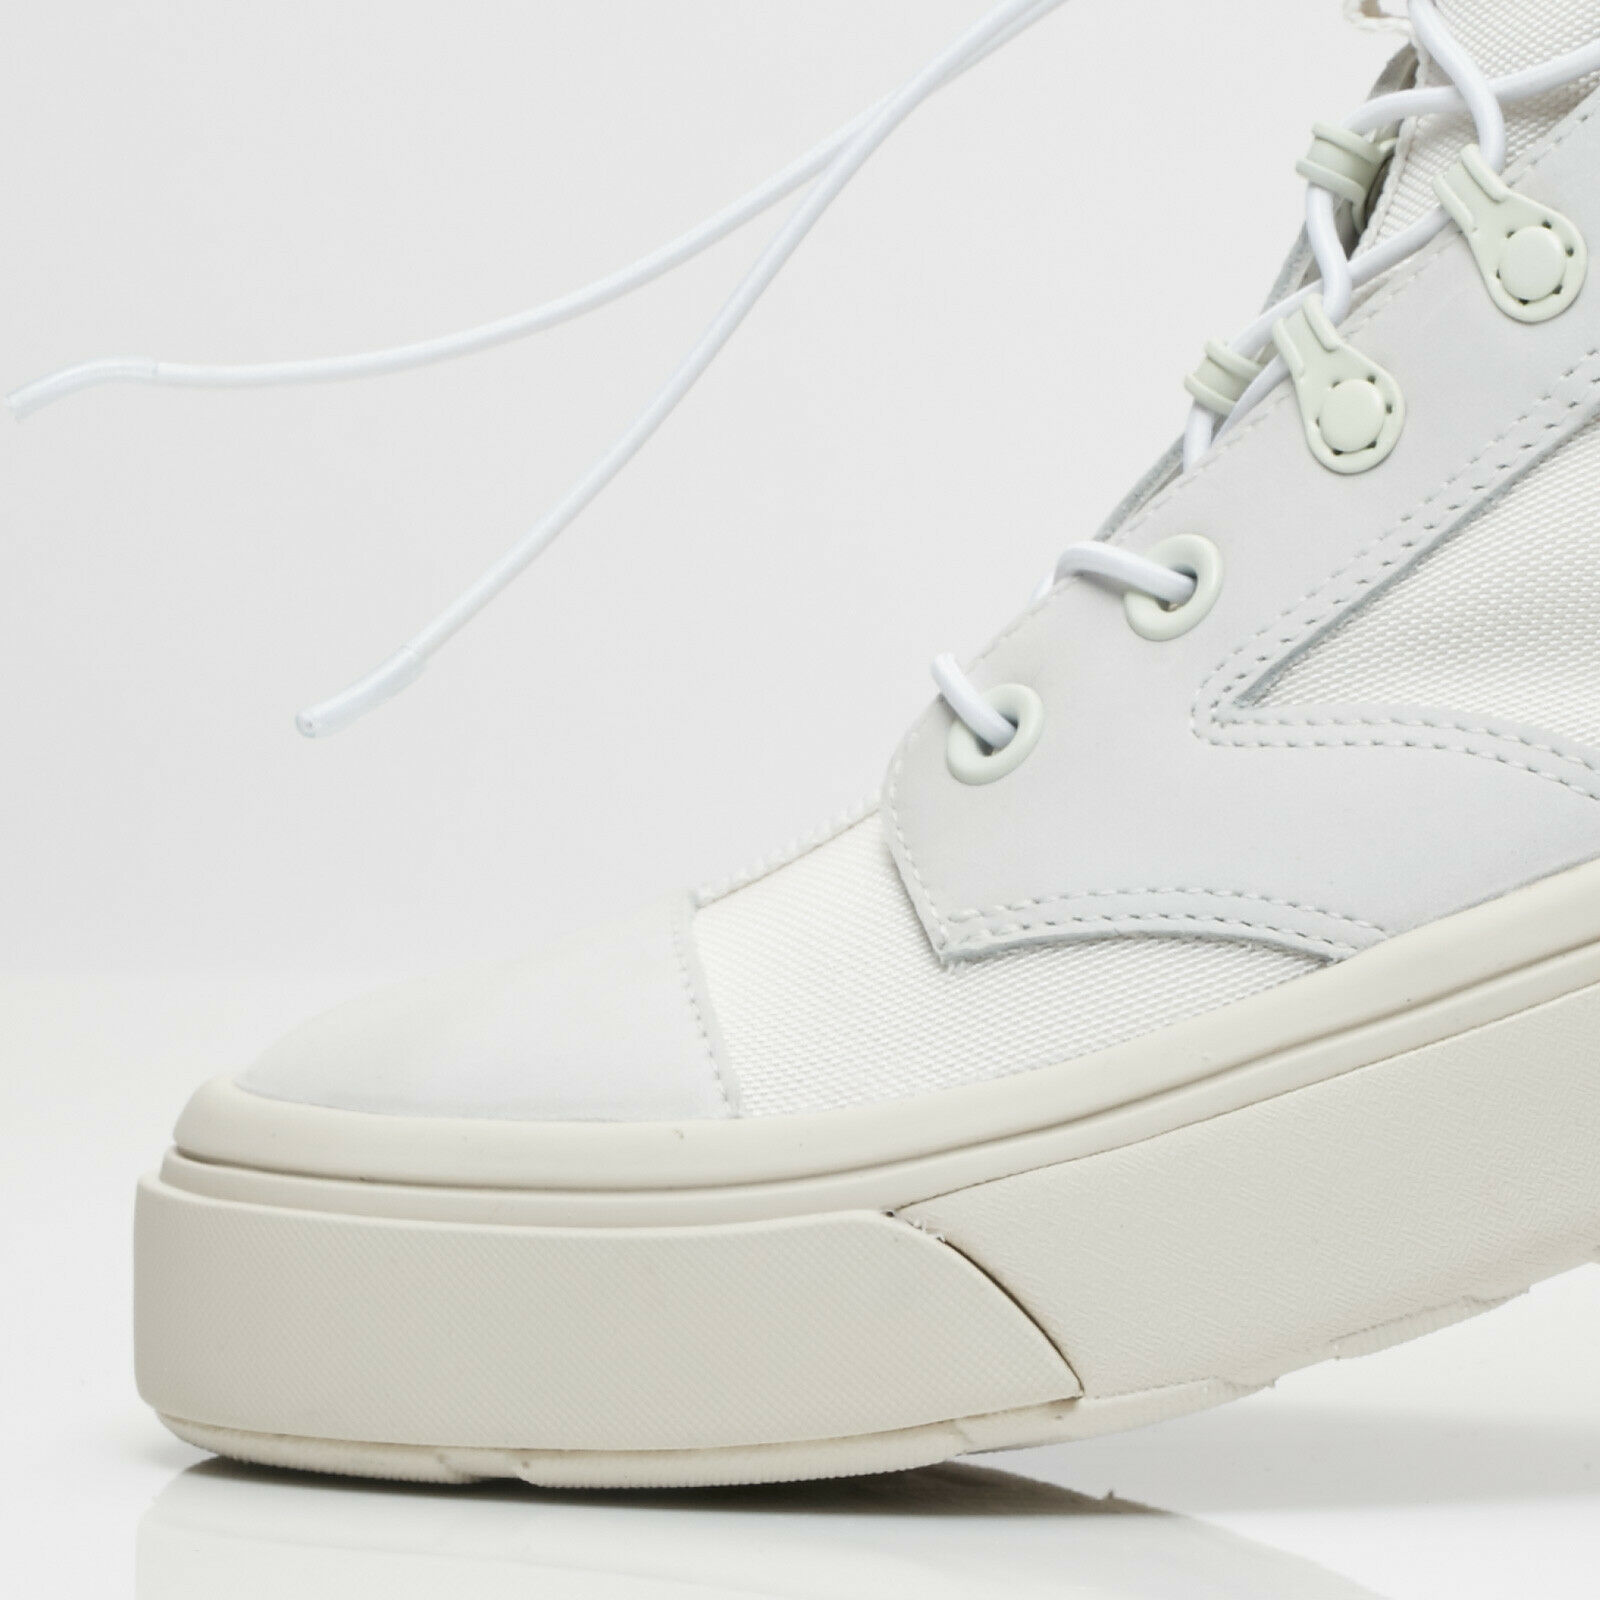 Mens Converse Jump Boot Gore-Tex Utility 160315C Blanc De Blanc Various Sizes image 6